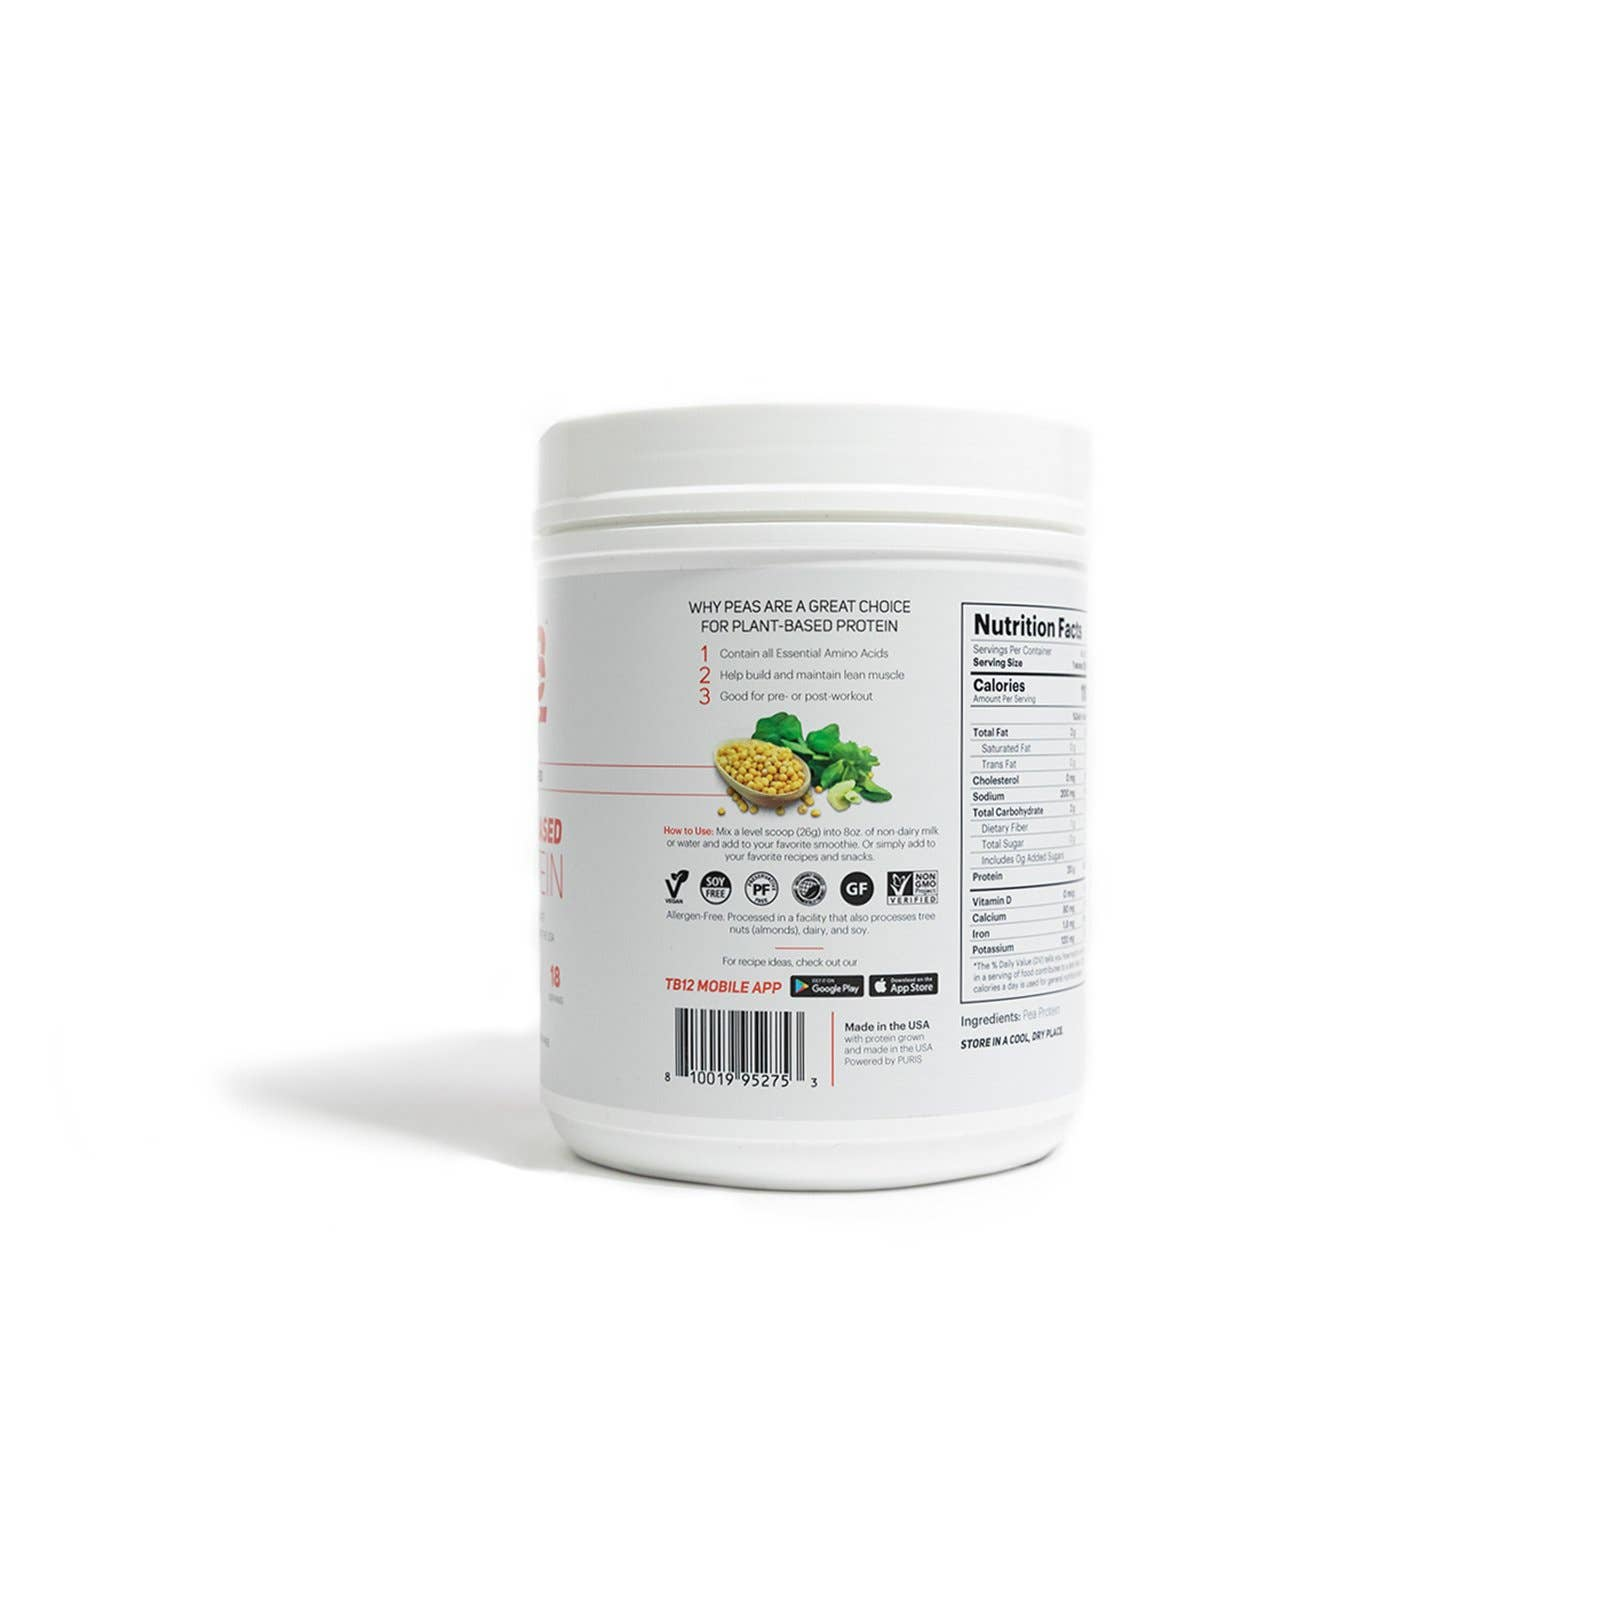 TB12 Plant-Based Protein (1LB)